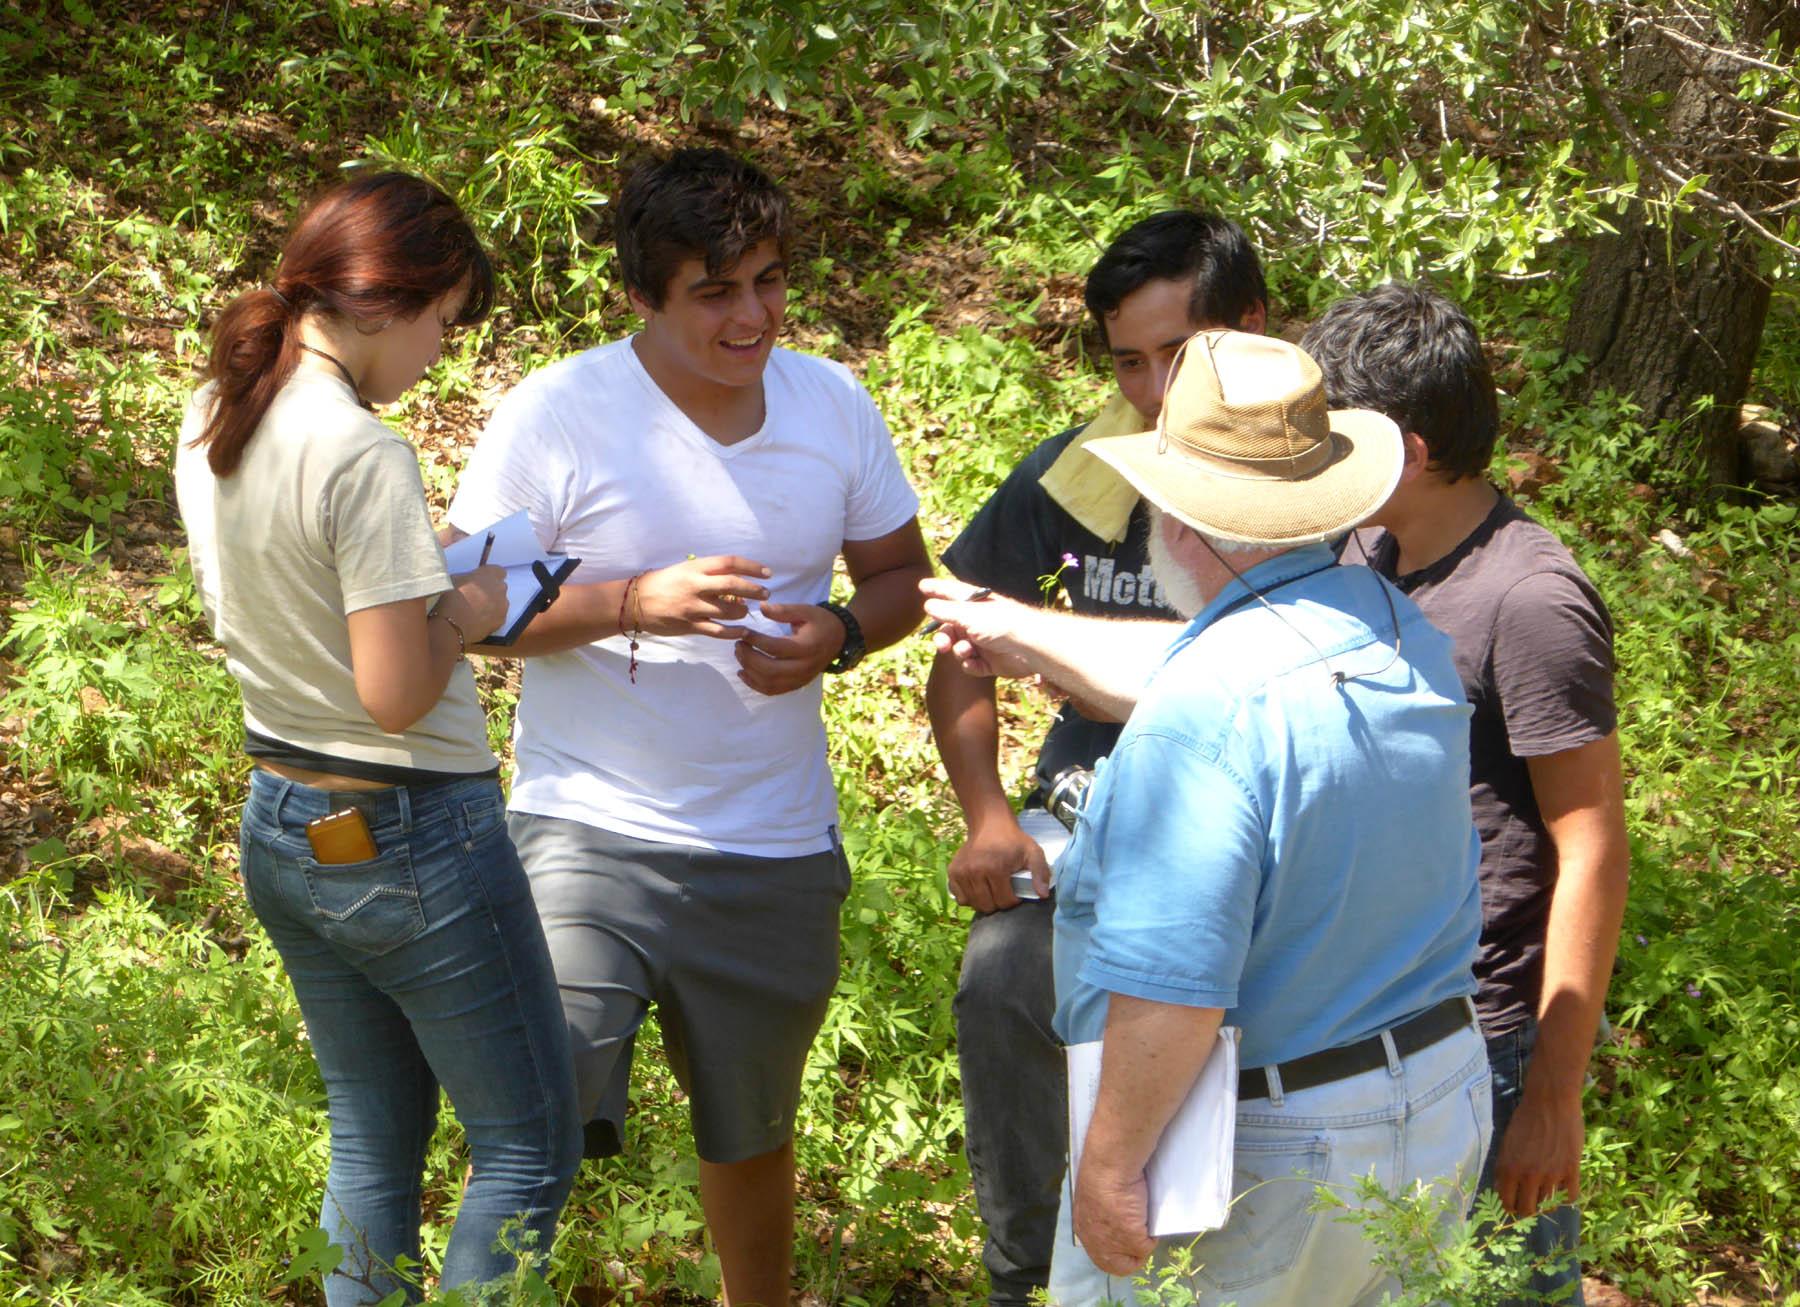 Tom & students-ALReinaG-SJuriquipa-Aug17-1a